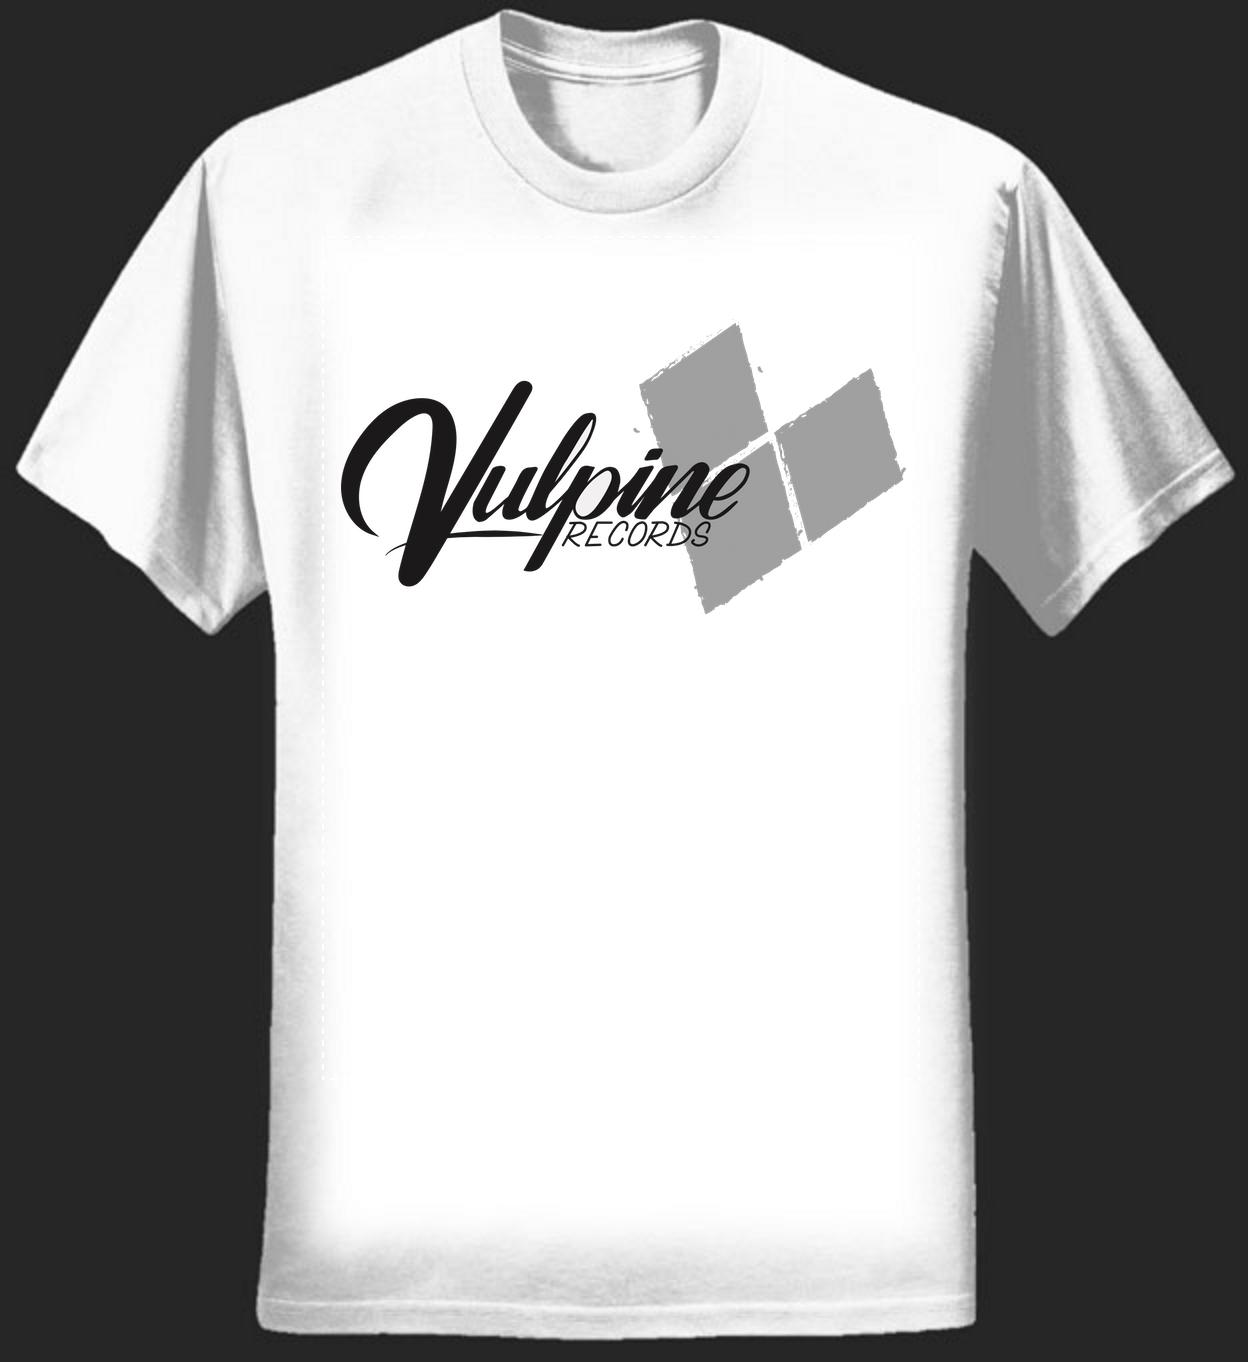 Vulpine Records T-Shirt